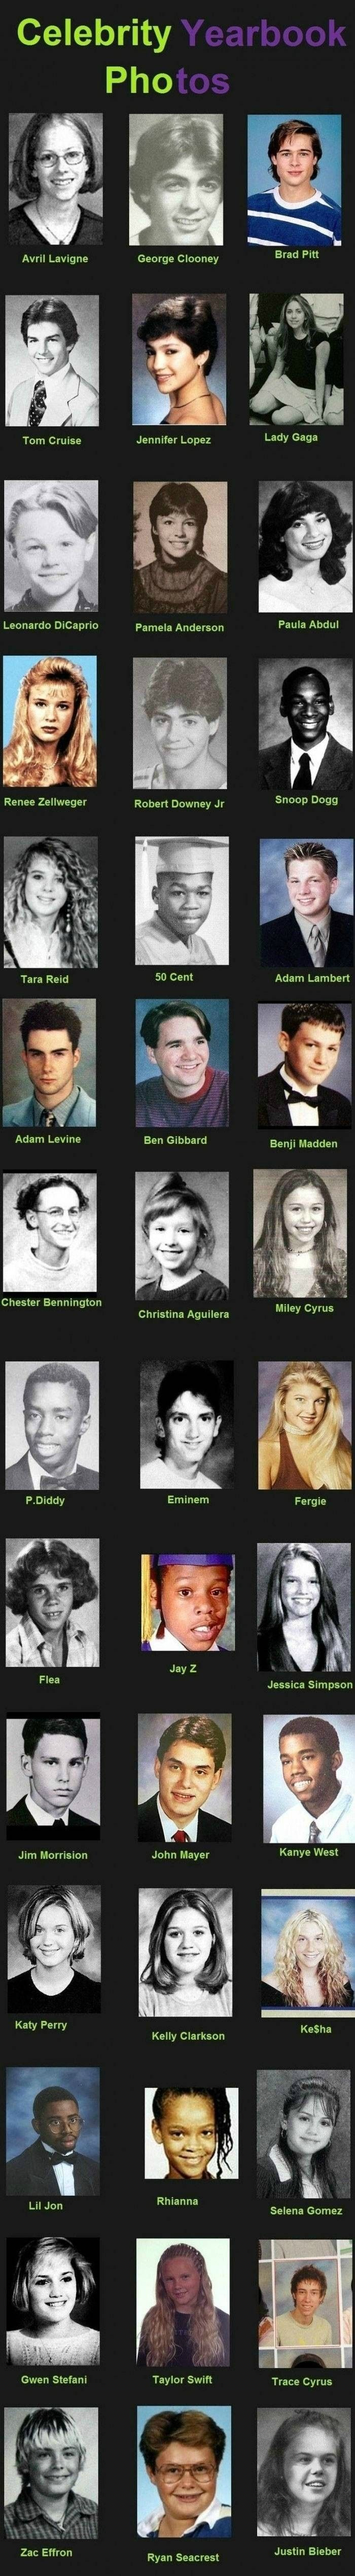 Michael Sheen - IMDb